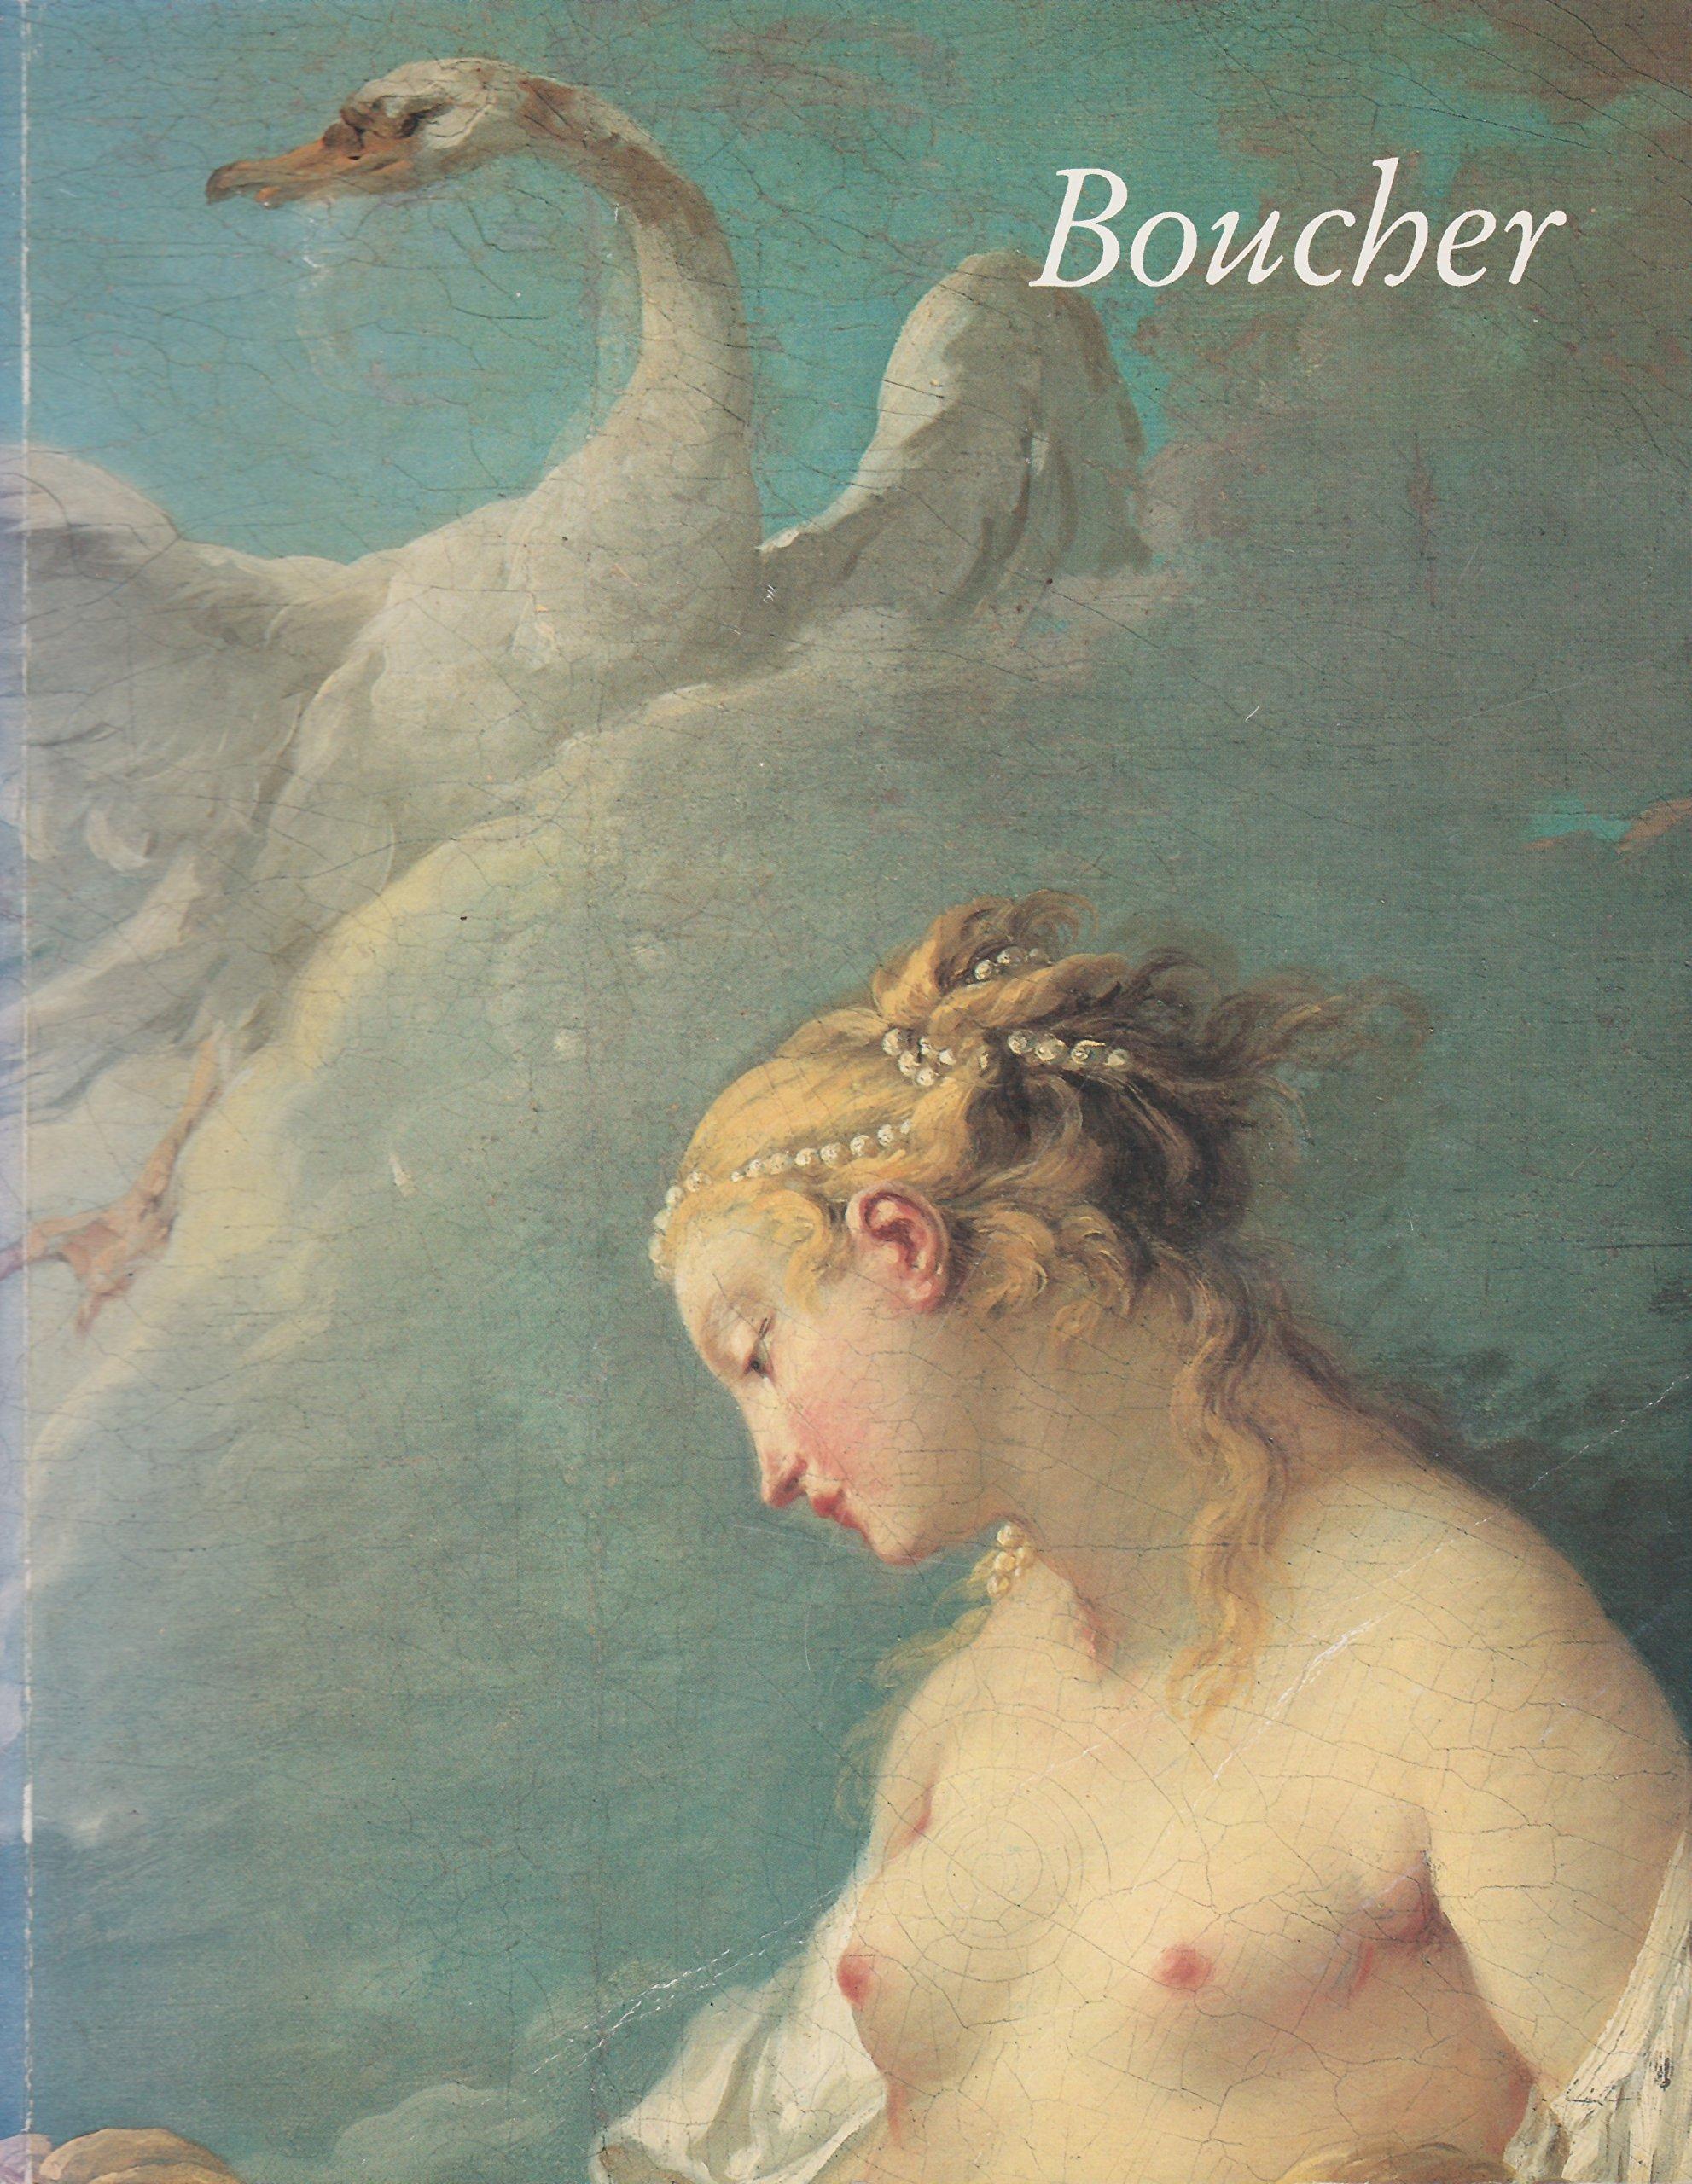 Boucher, François